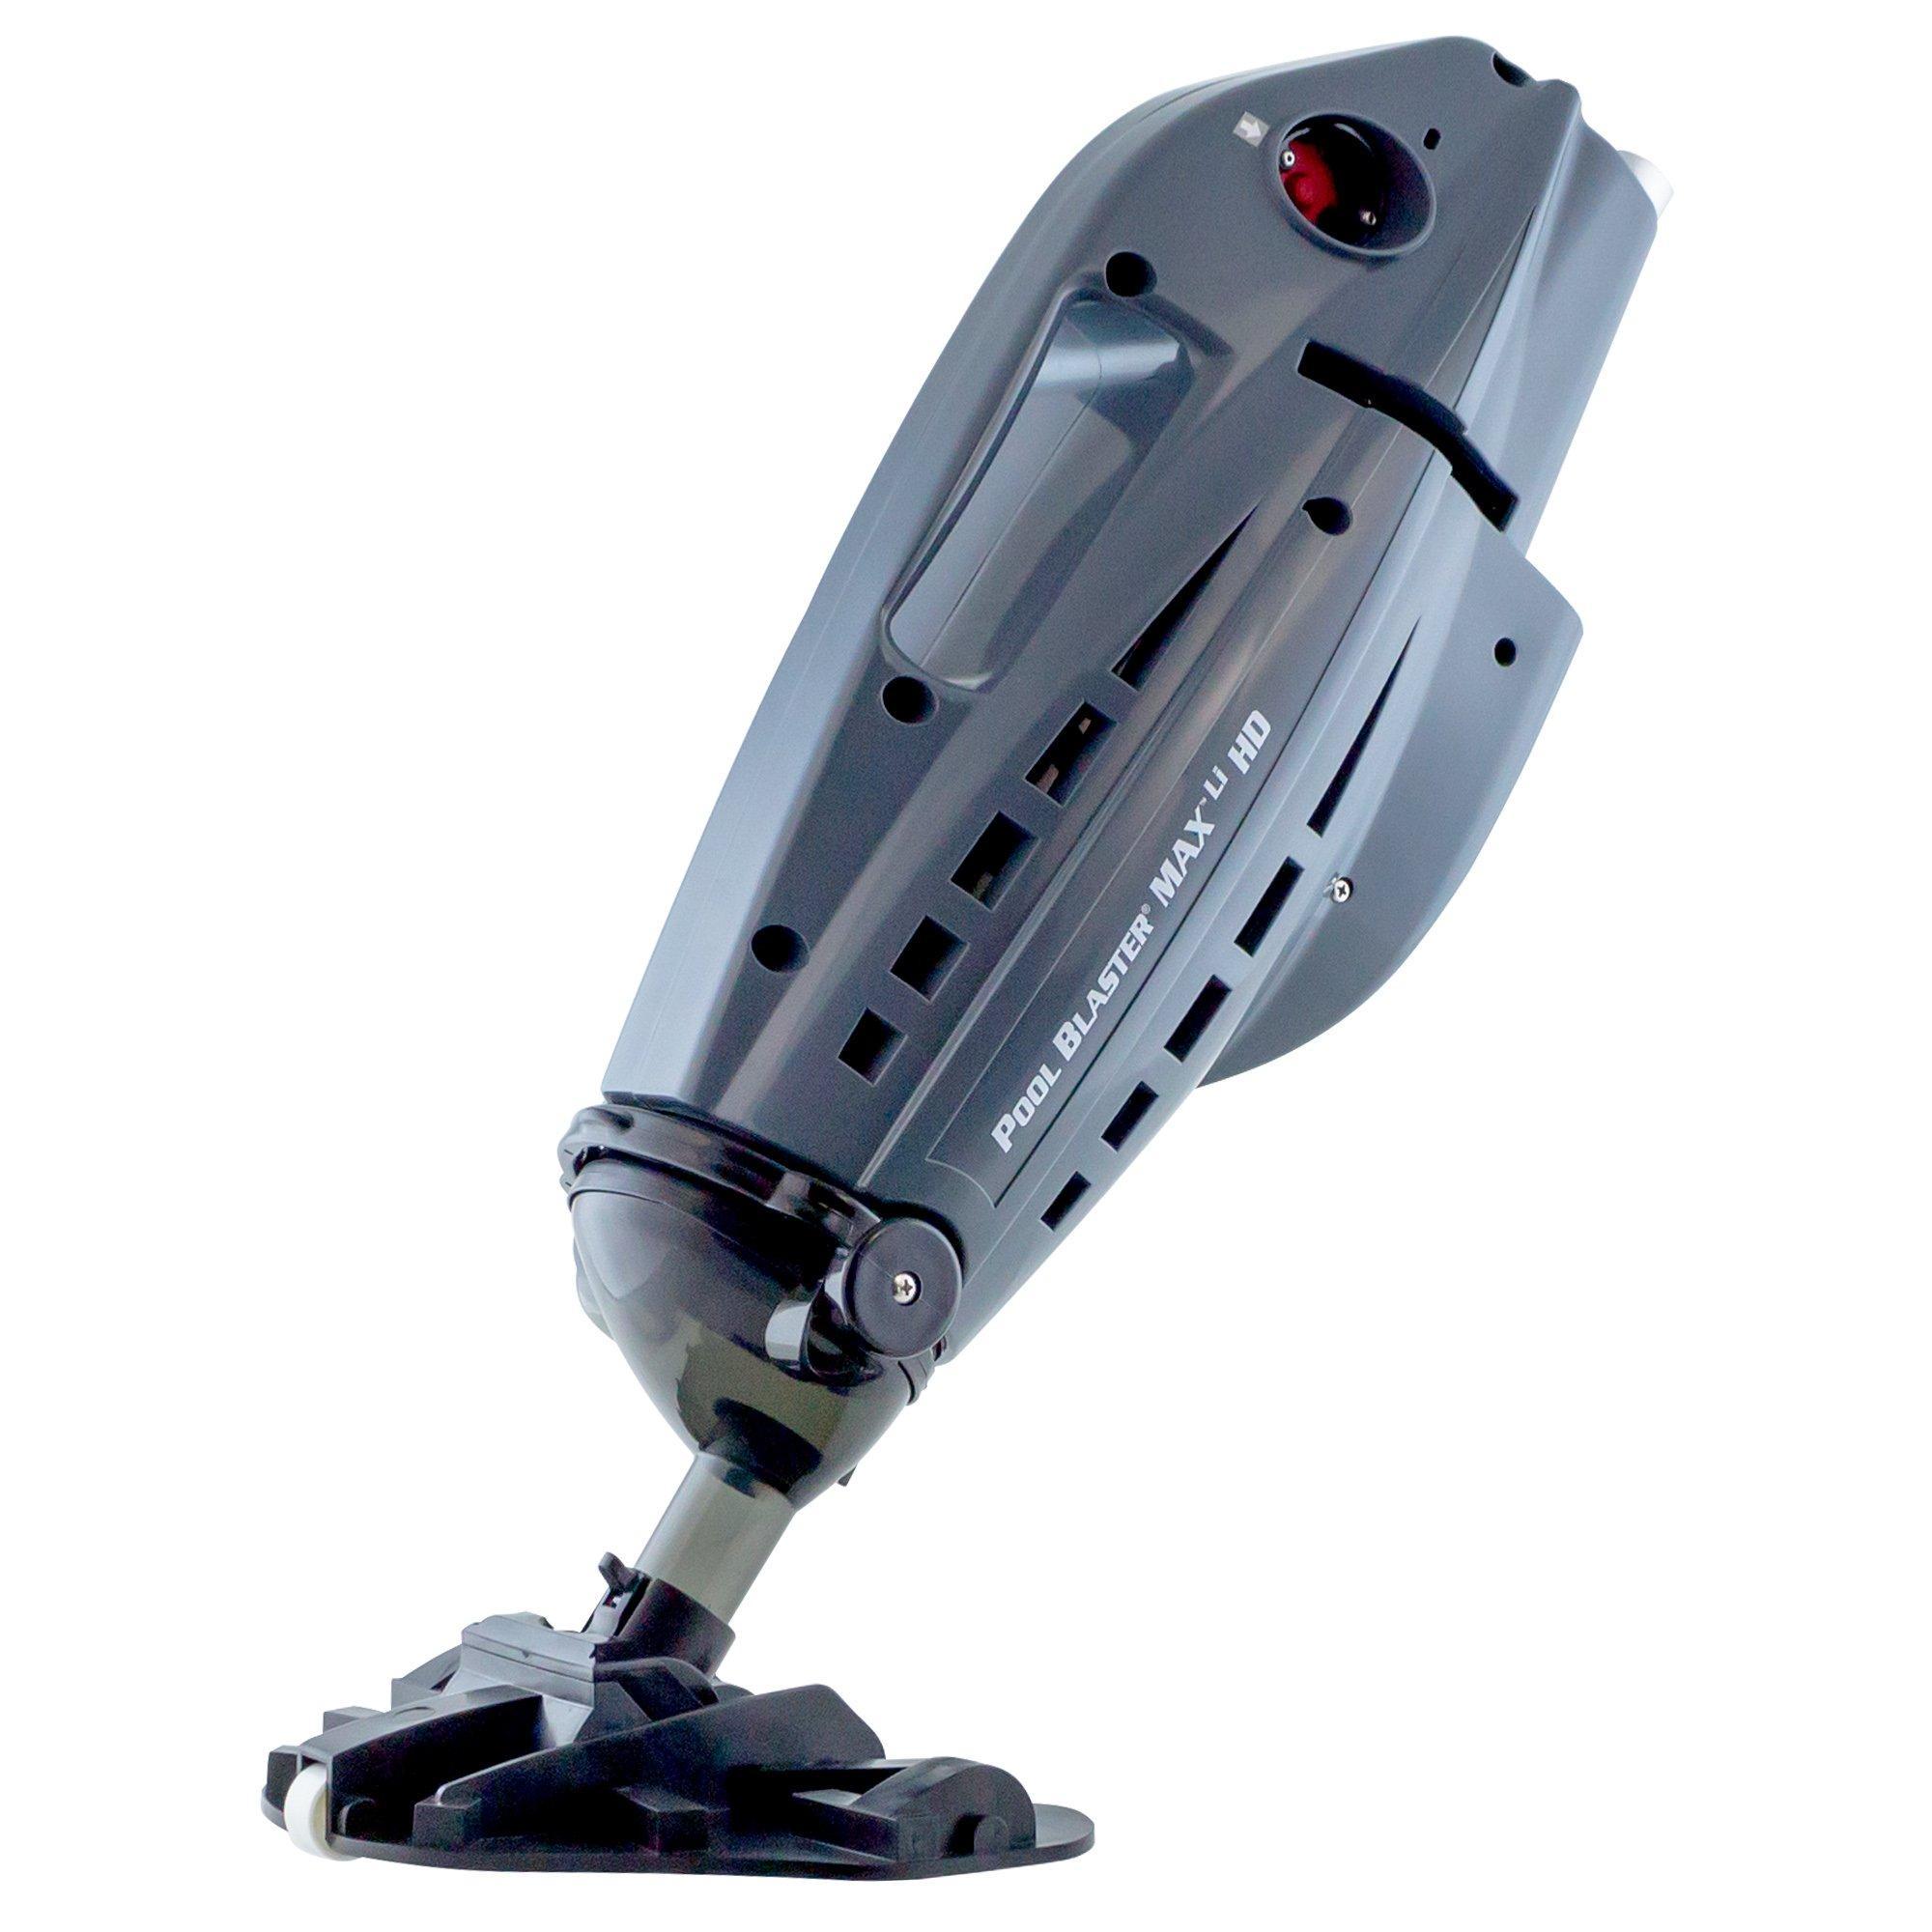 Pool Blaster Max Li Hd Hand Held Pool And Spa Vacuum